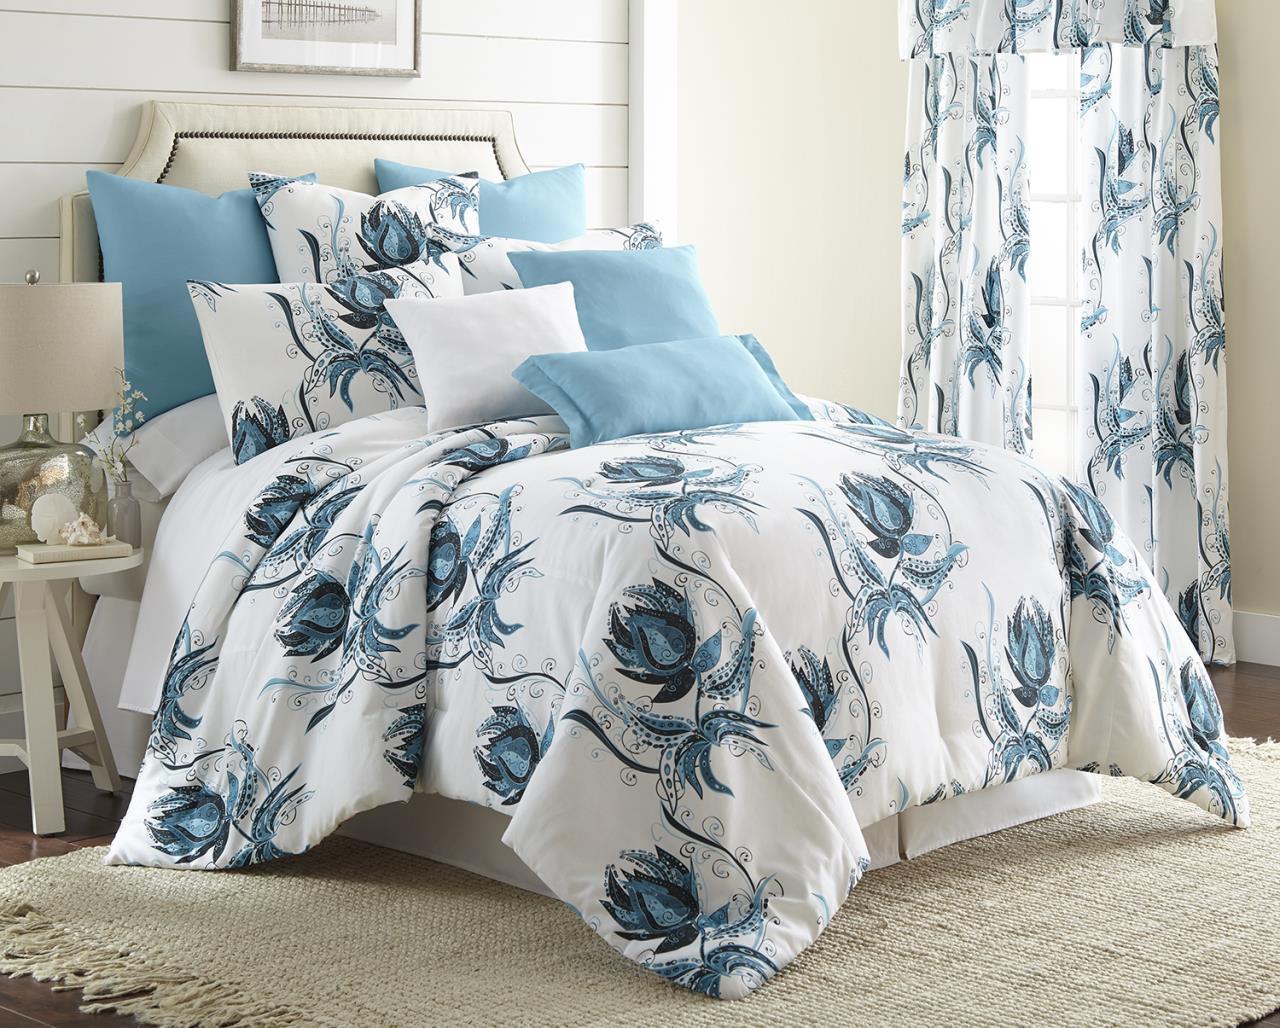 Seascape Bedding Collection -